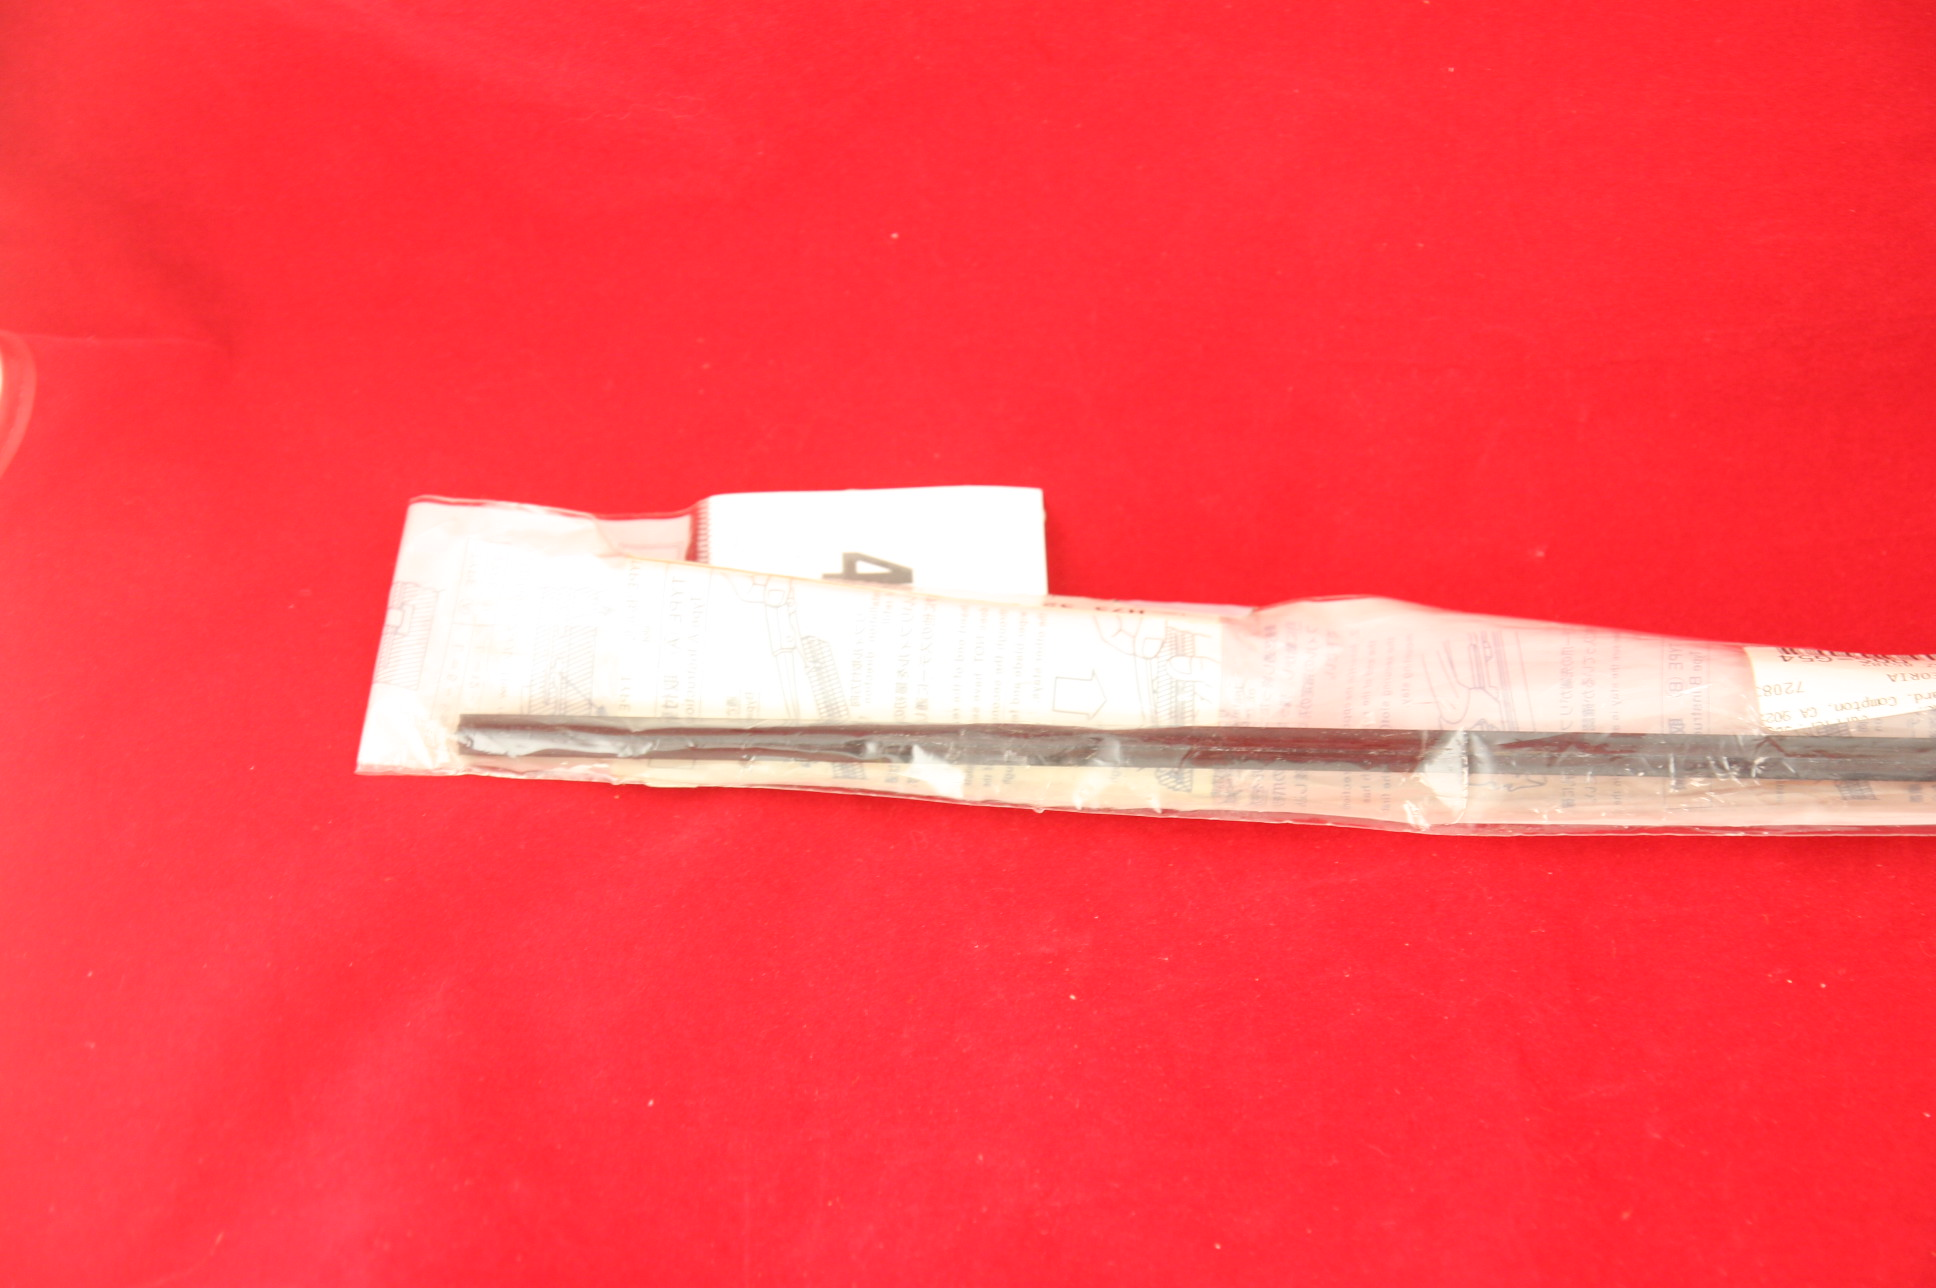 ~ New Nissan OEM 28895-79902 Infiniti Wiper Blade Refill Insert Free Shipping - image 3